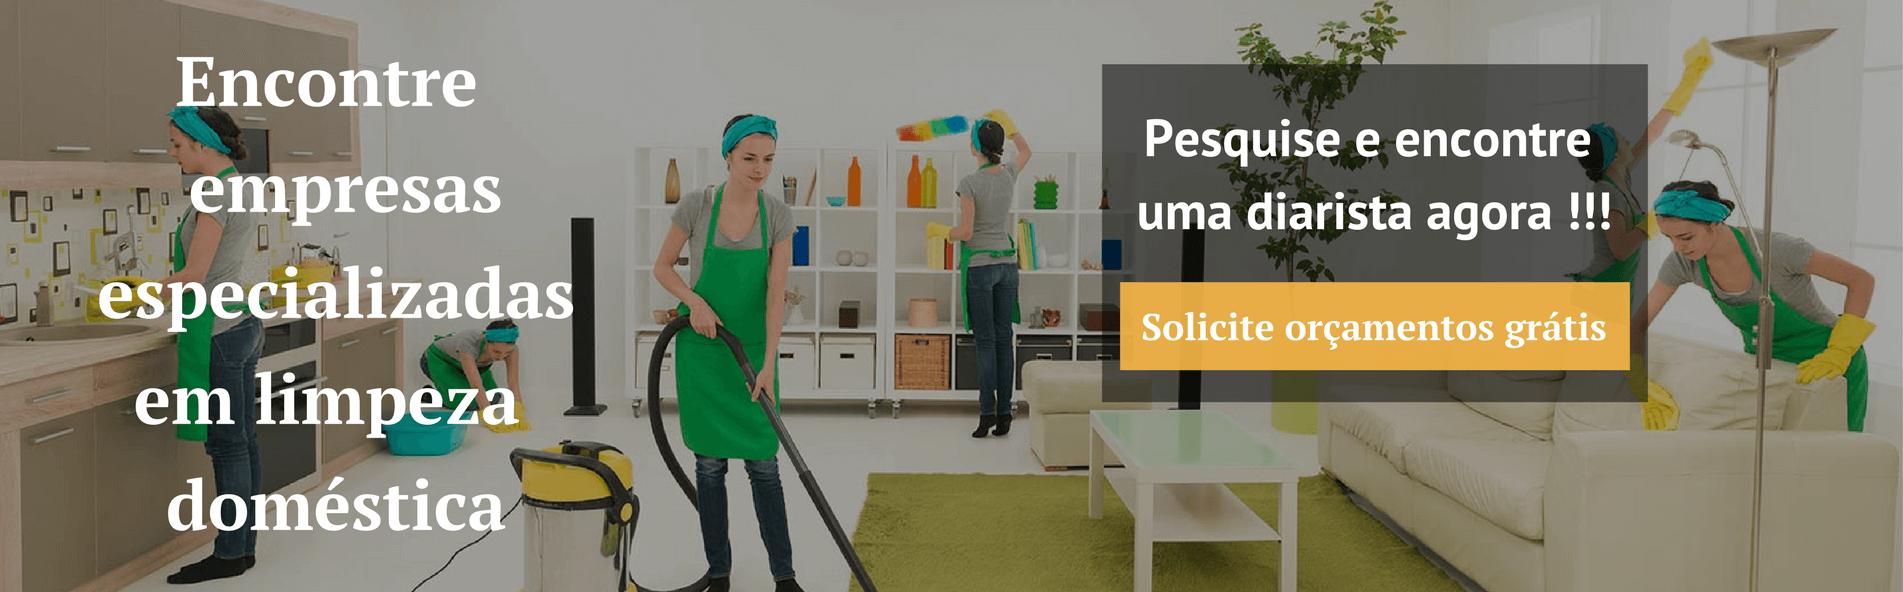 https://s3.amazonaws.com/limpezaprofissional/Banner-1-Novo-II.png